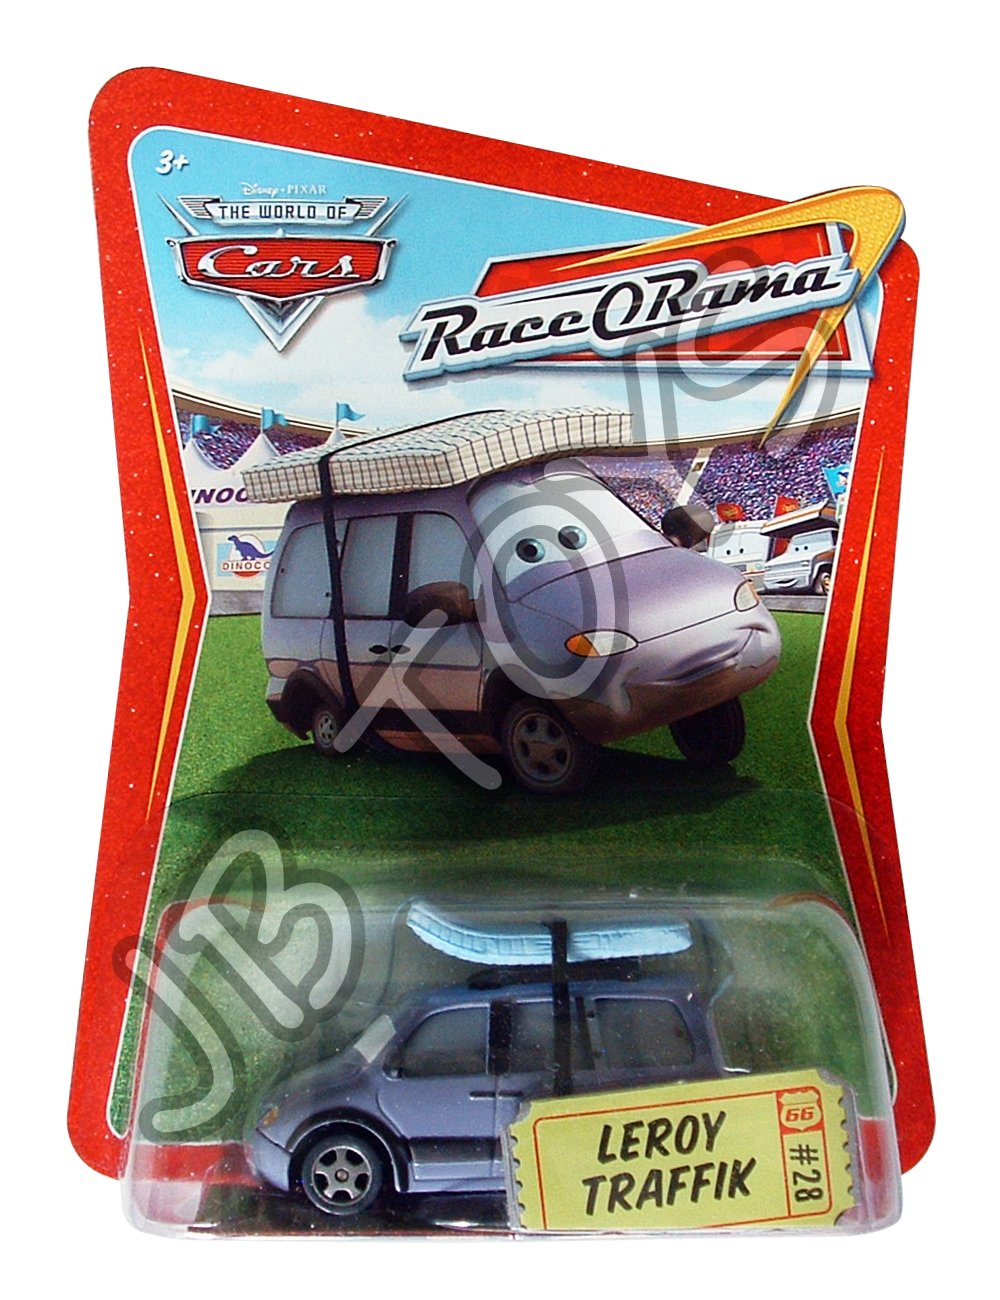 Disney PIxar Cars #28 Leroy Traffik Diecast Car Race O Rama World of Cars